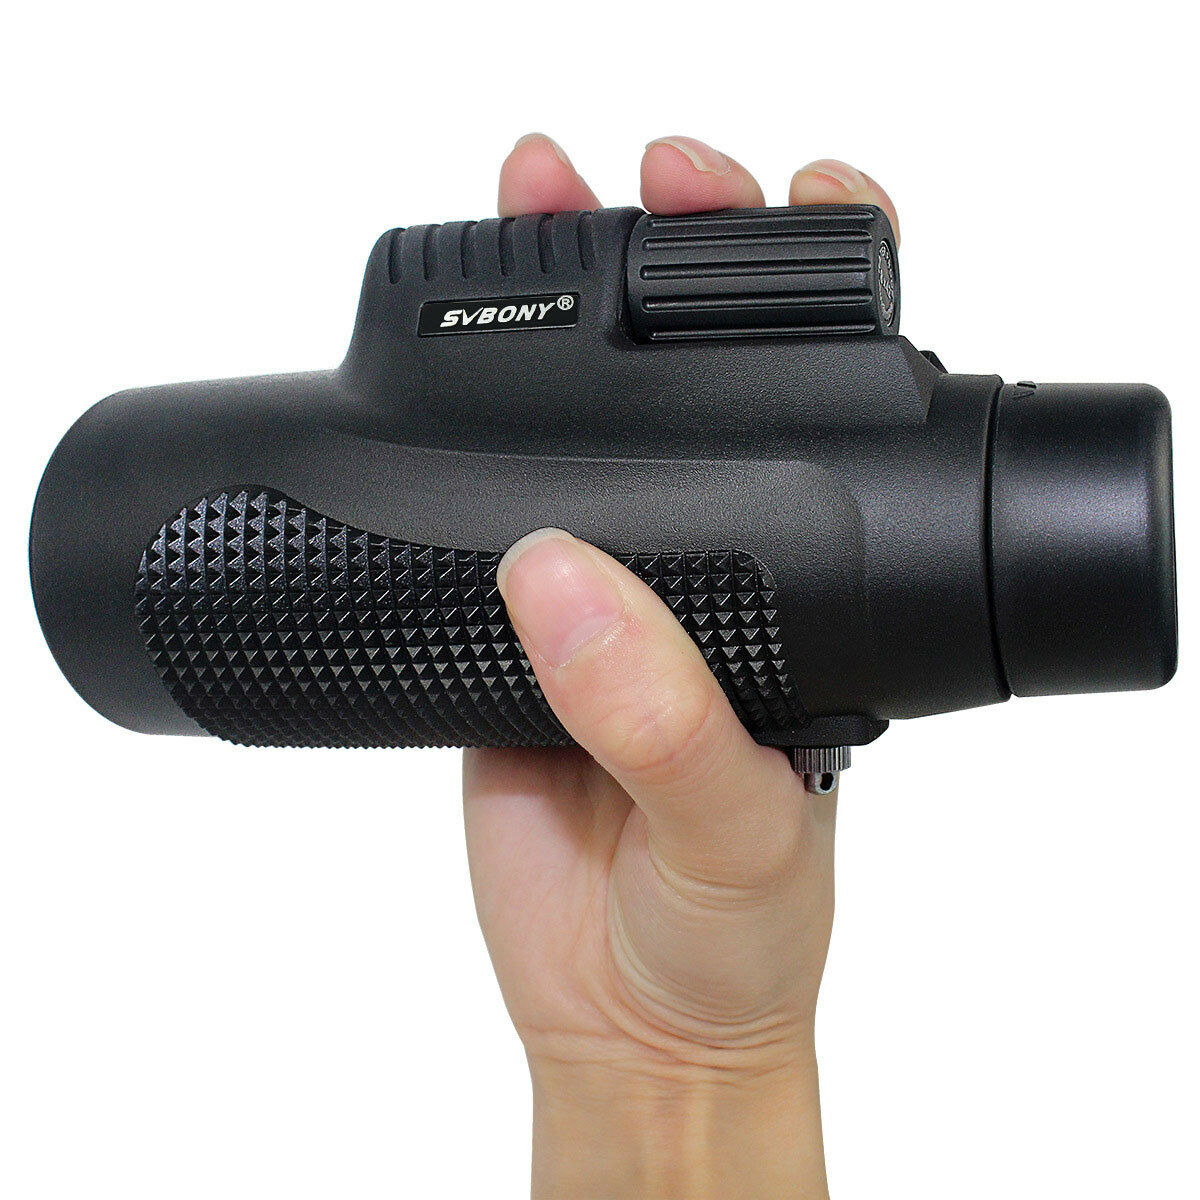 New SVBONY 8x42 BK-7 Water/Fogproof  Monocular Single Hand  for Bird Watching